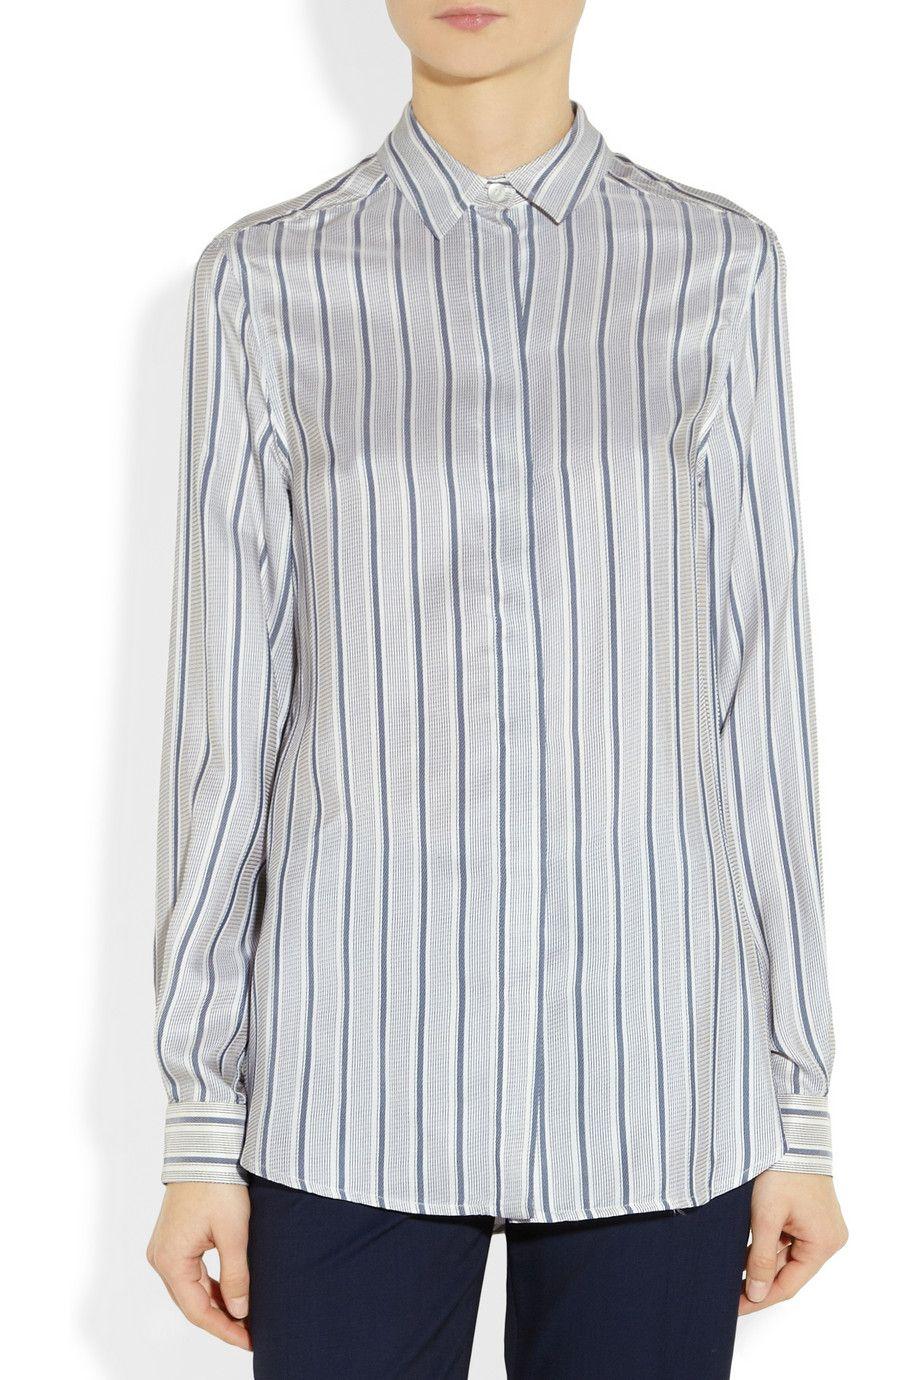 Gucci|Marine striped silk shirt|NET-A-PORTER.COM